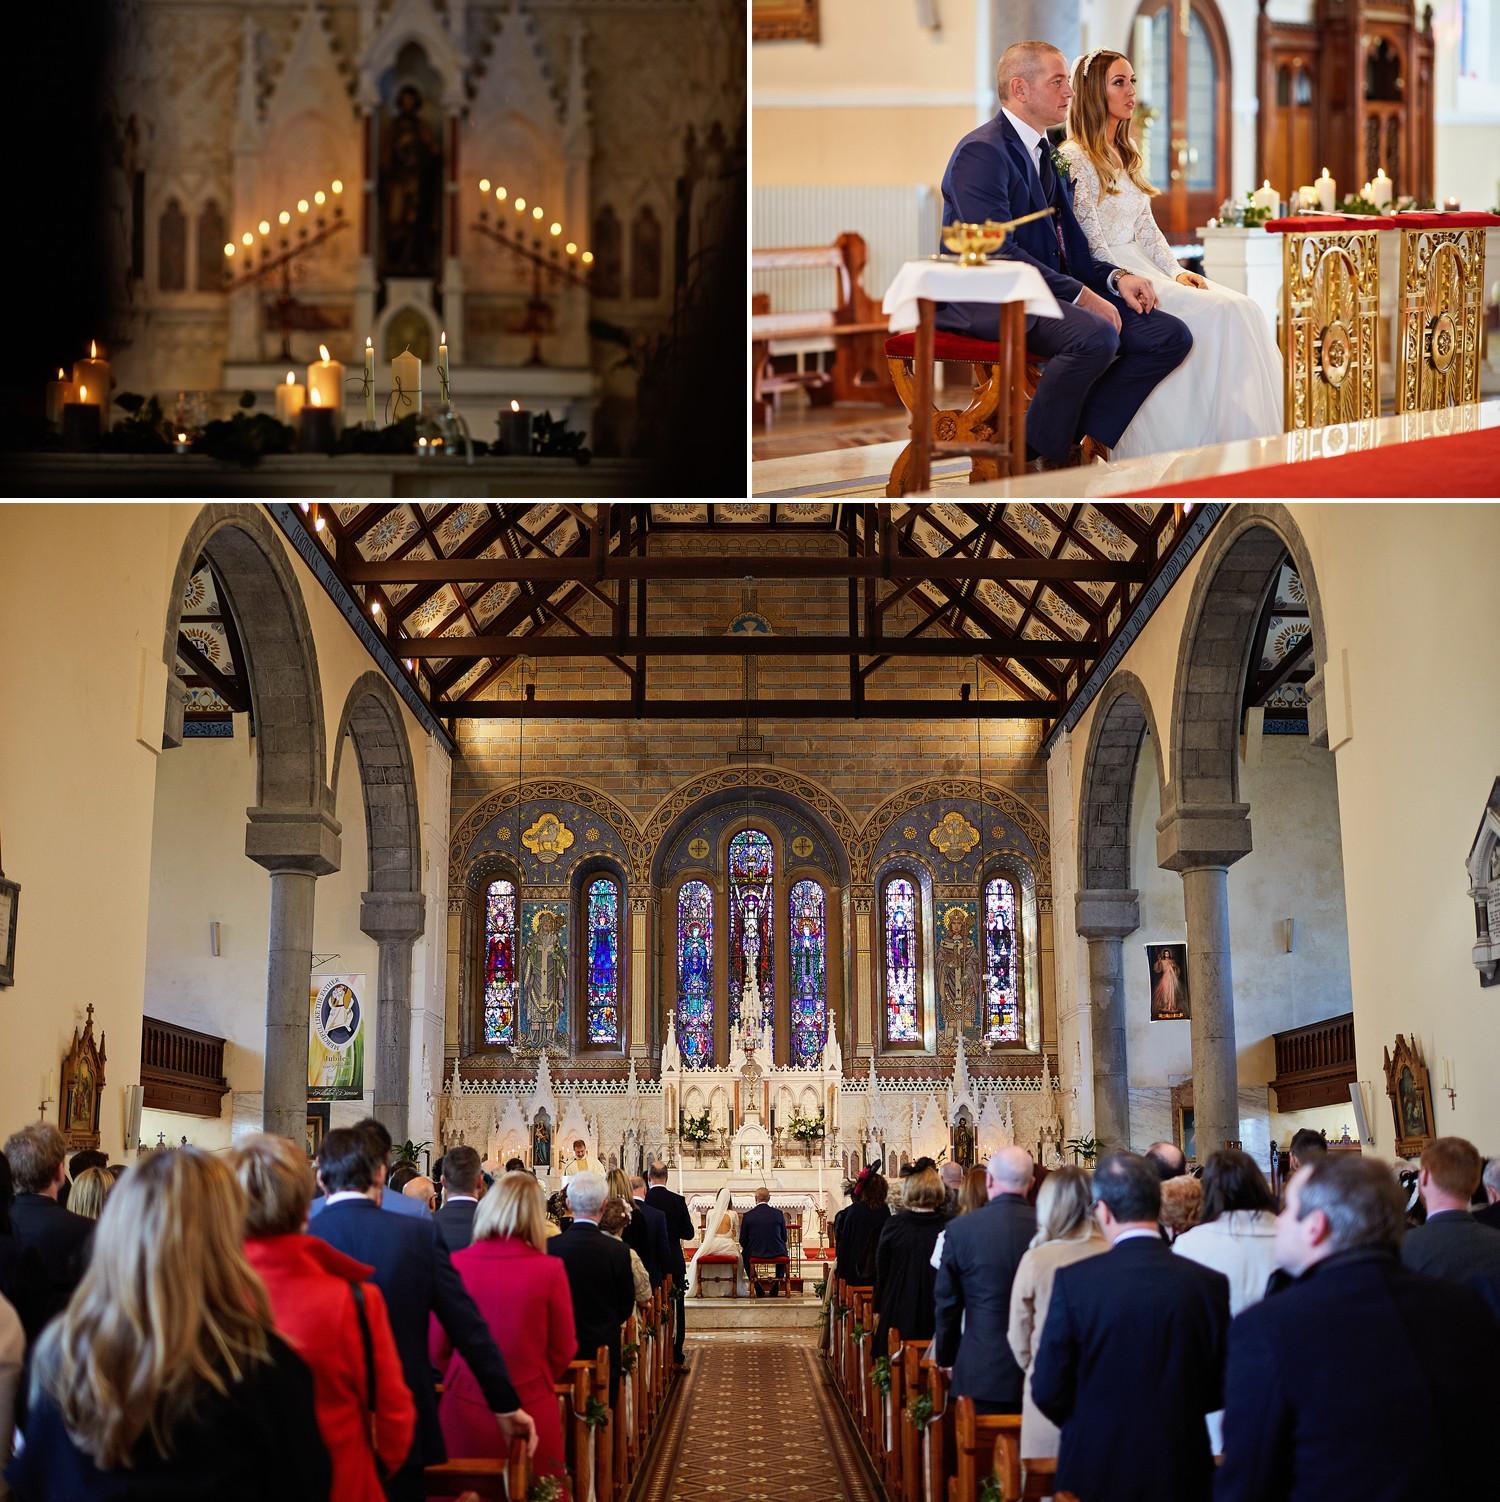 Rosaleen & Joseph's wedding in Kilrush followed by reception in Bunratty Castle Hotel